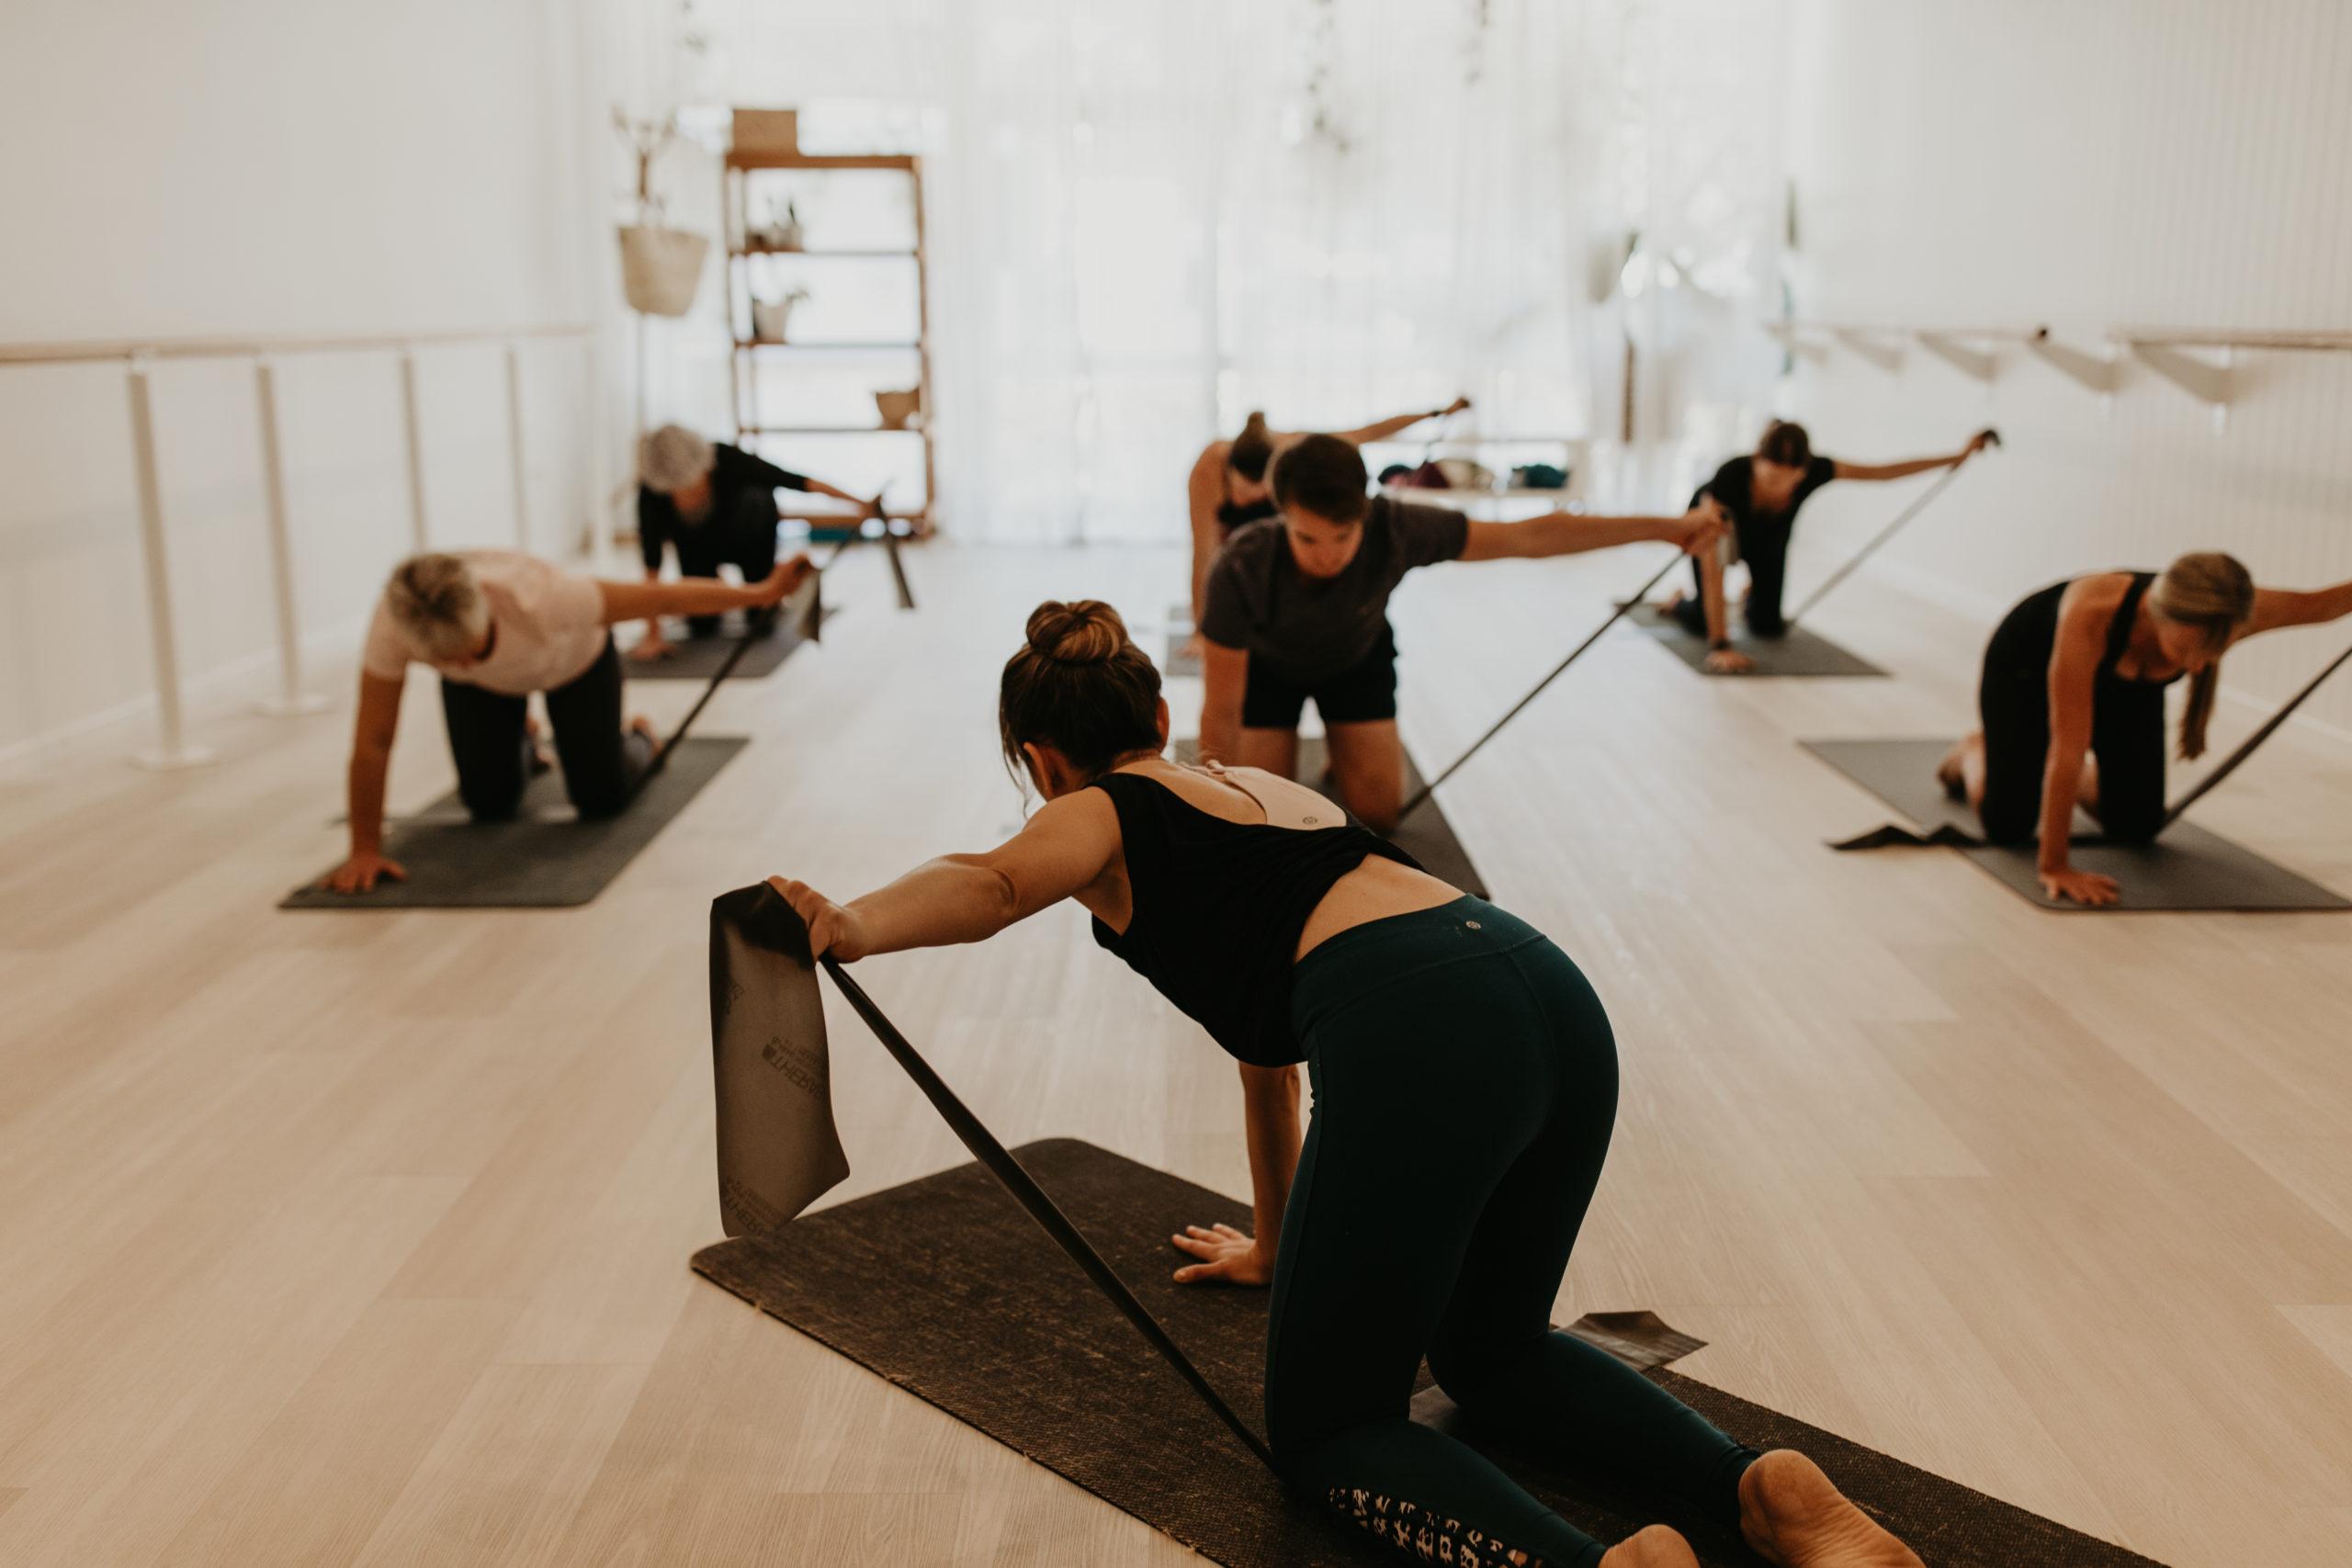 pilates buderim haven yoga barre studio class